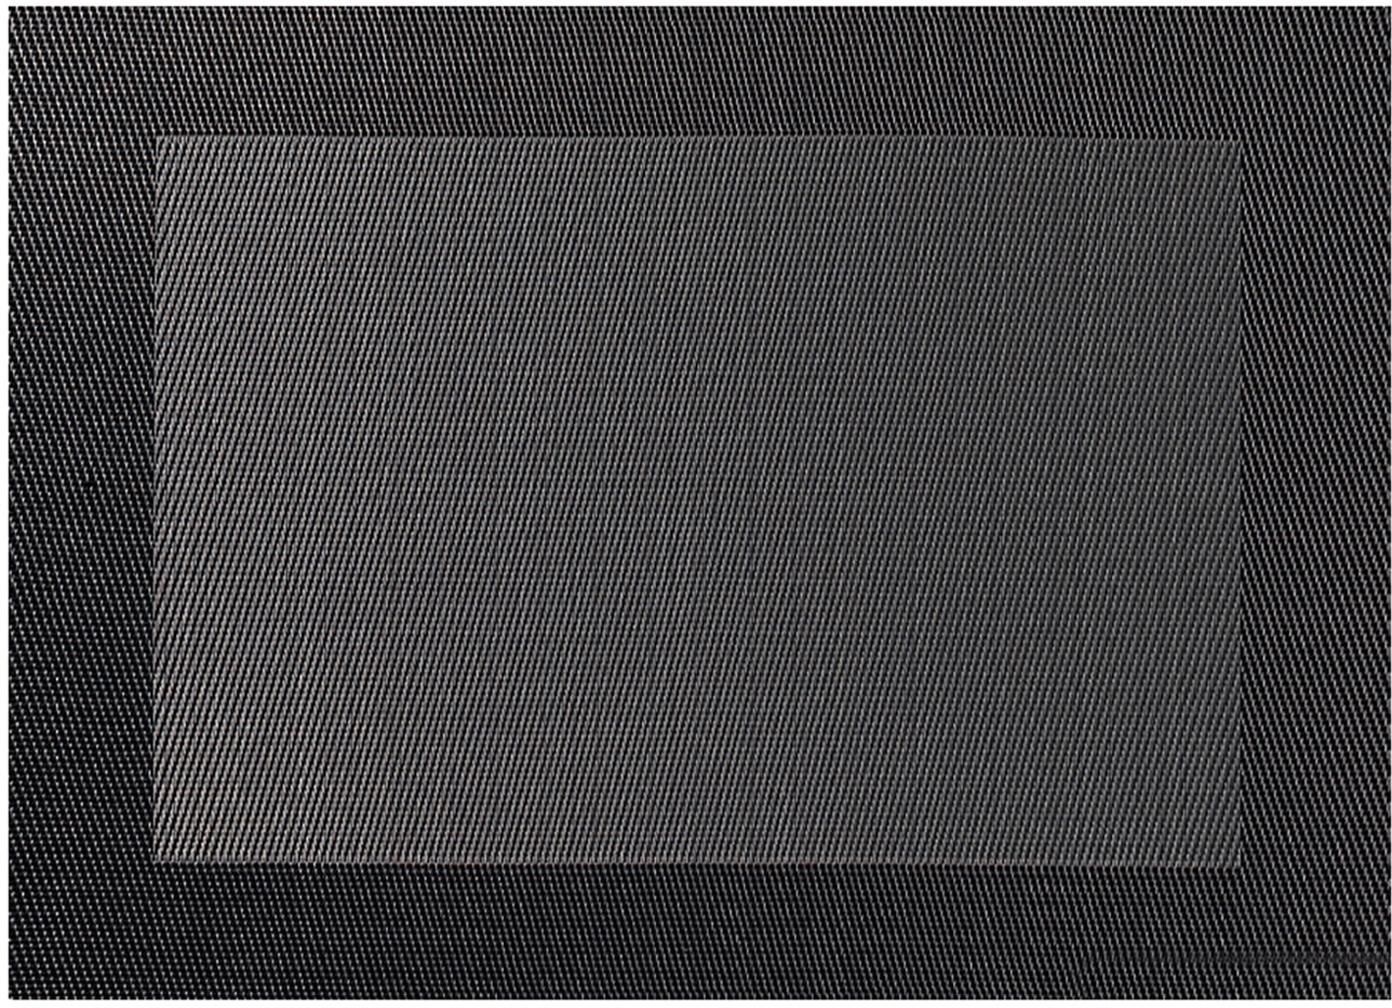 Placemats Trefl, 2 stuks, Kunststof (PVC), Donkergrijs, antraciet, 33 x 46 cm